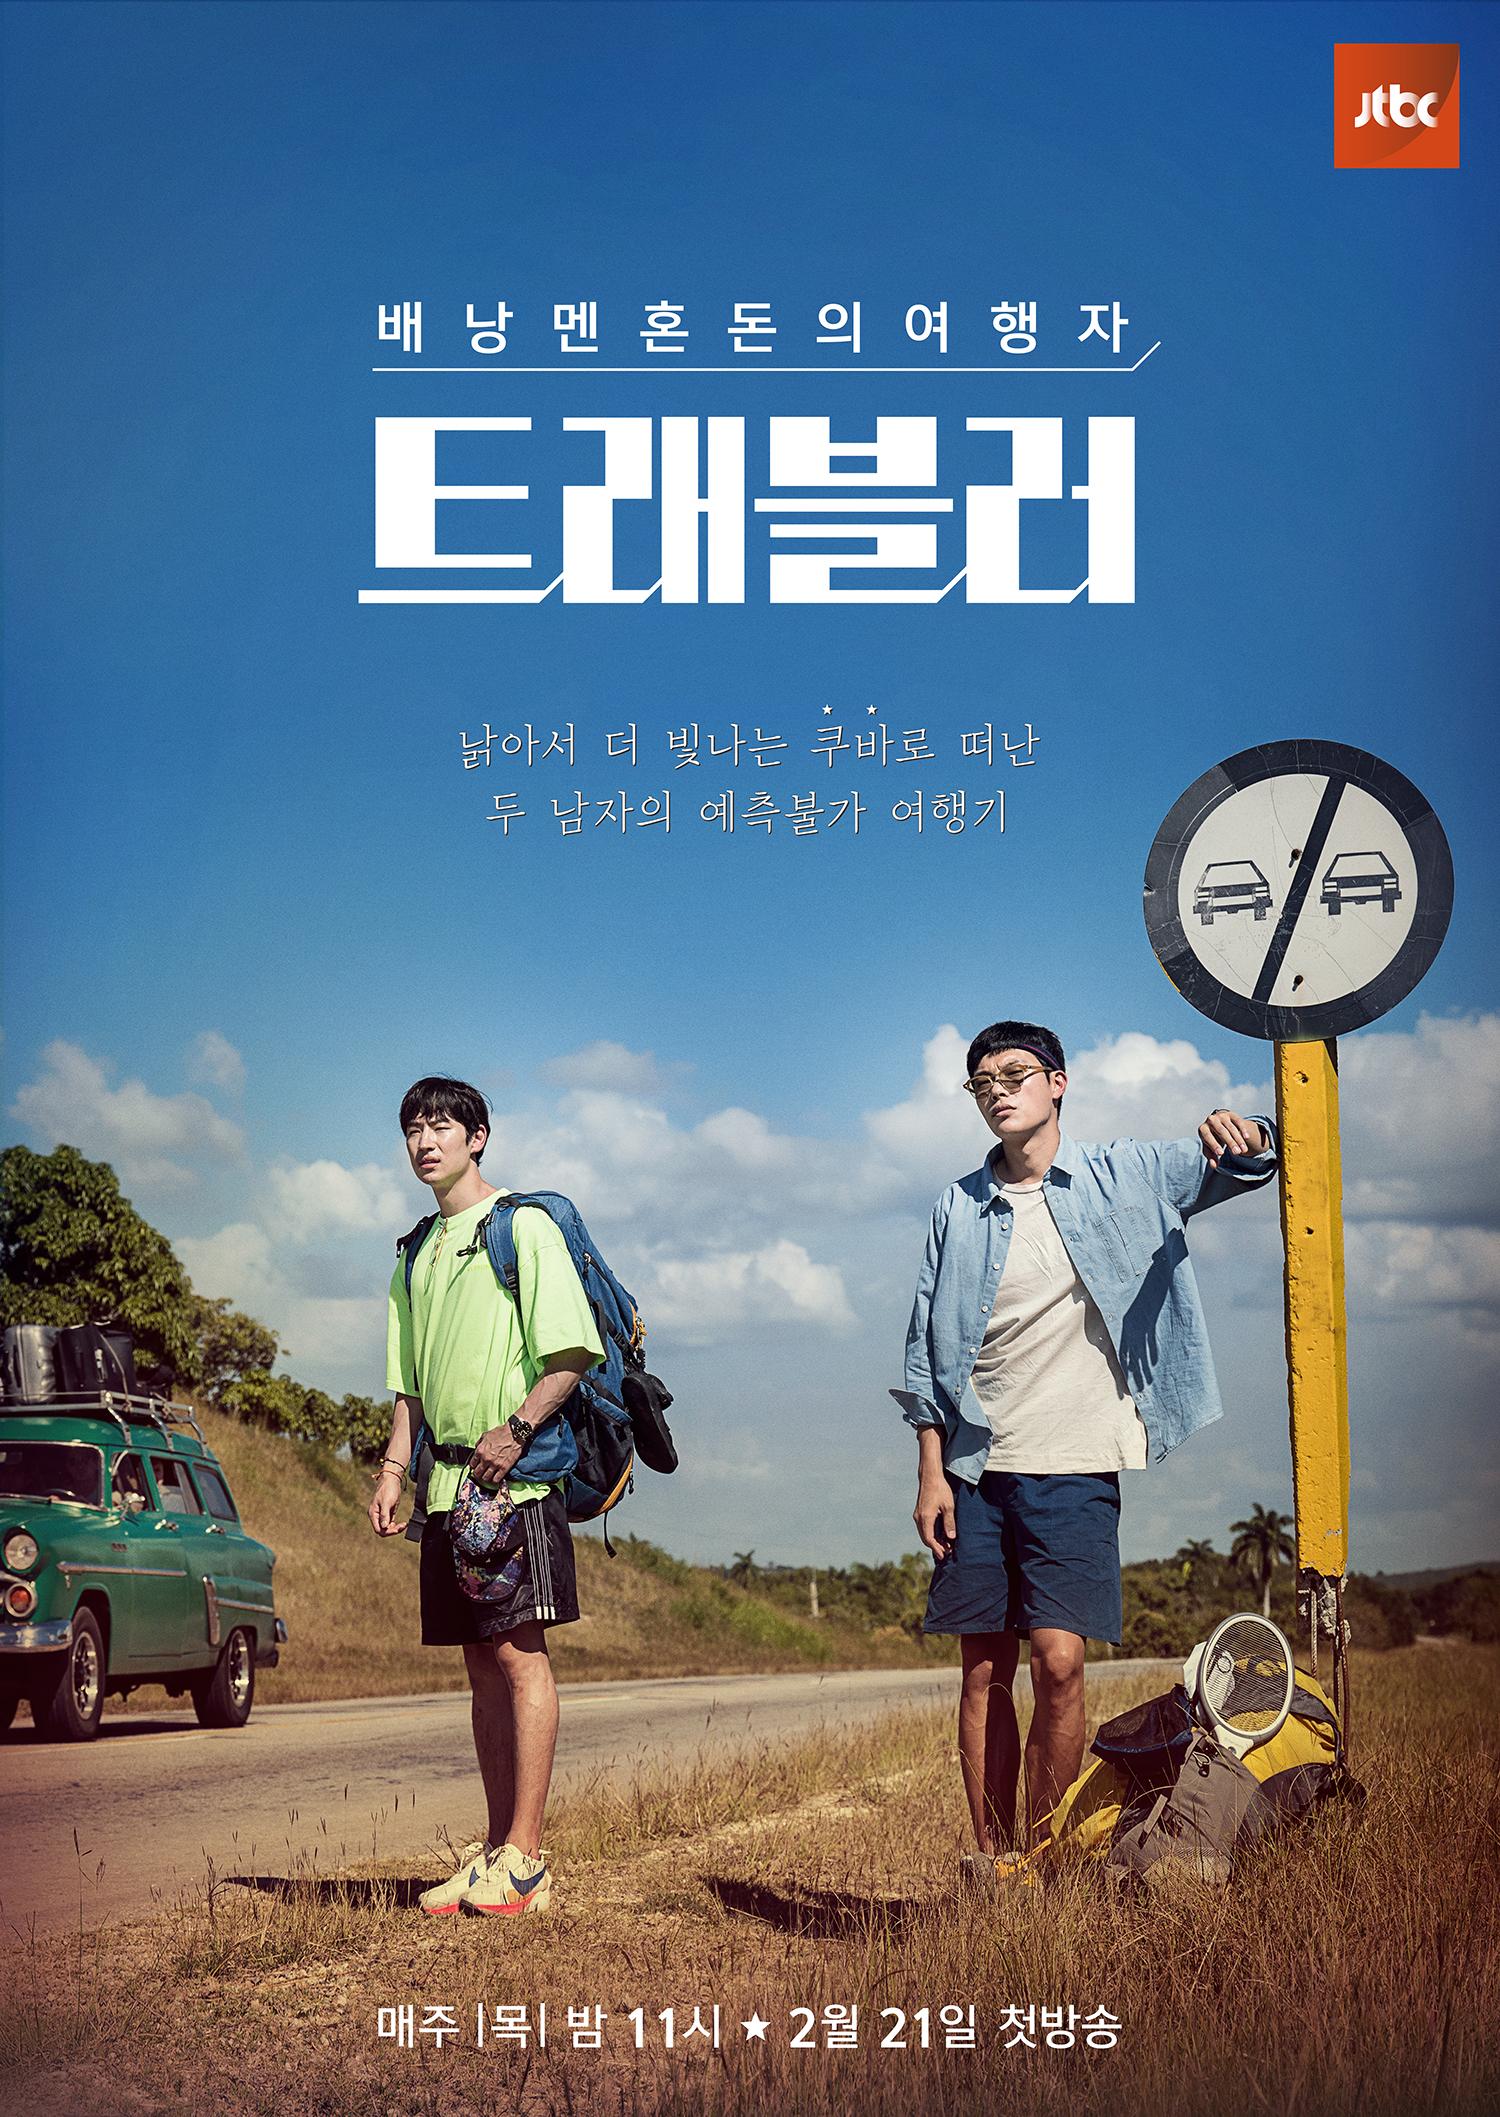 Traveler cast, Traveler summary, Traveler tv show, ryu junyeol lee jehoon, Traveler cuba, korean tv show cuba, ryu junyeol cuba, lee jehoon cuba, ryu junyeol 2019, lee jehoon 2019,